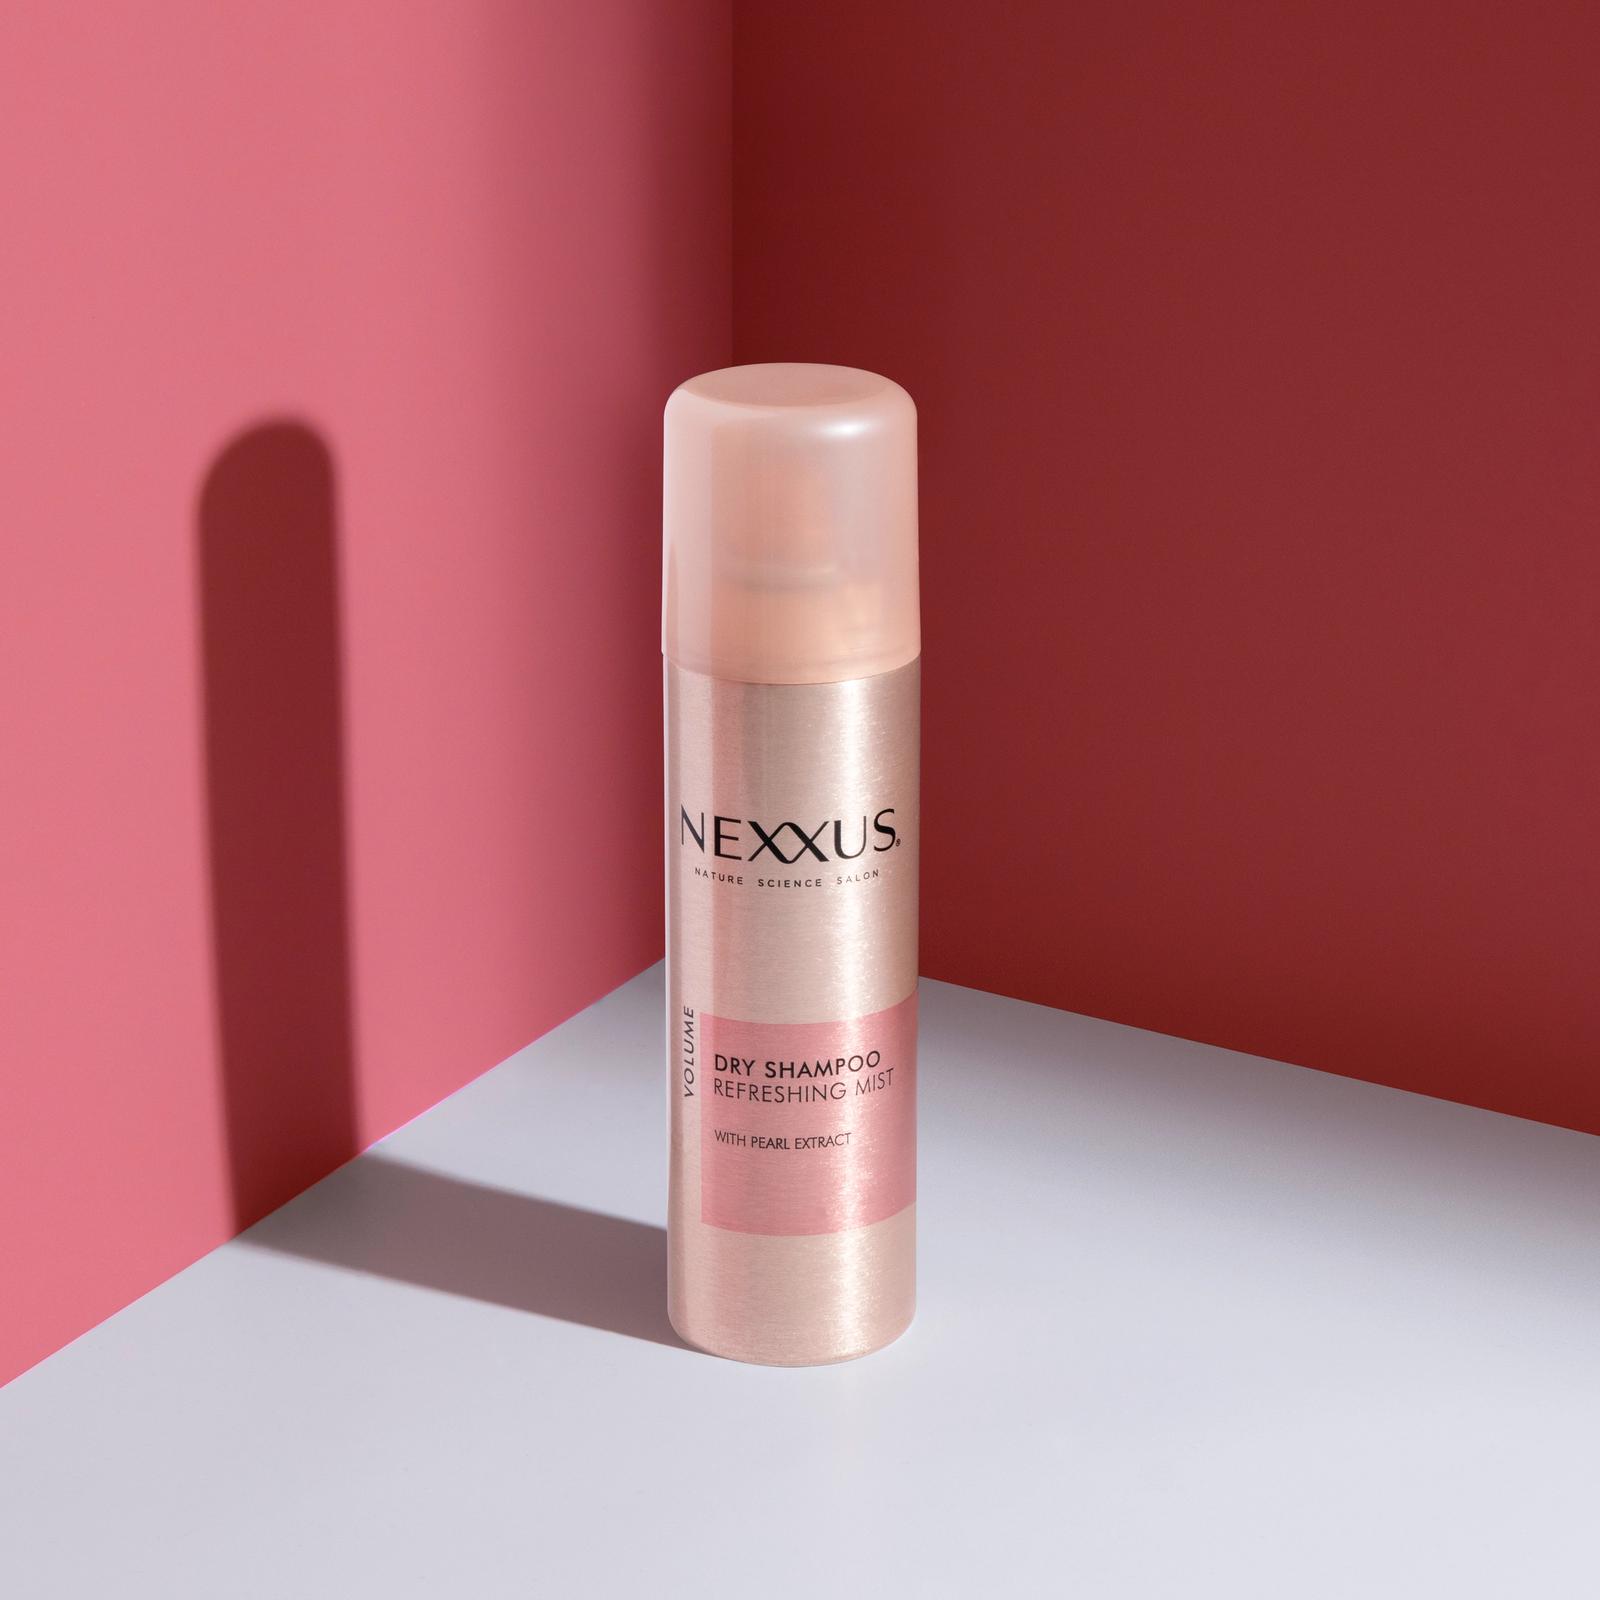 Nexxus Dry Shampoo Refreshing Mist Product Shot